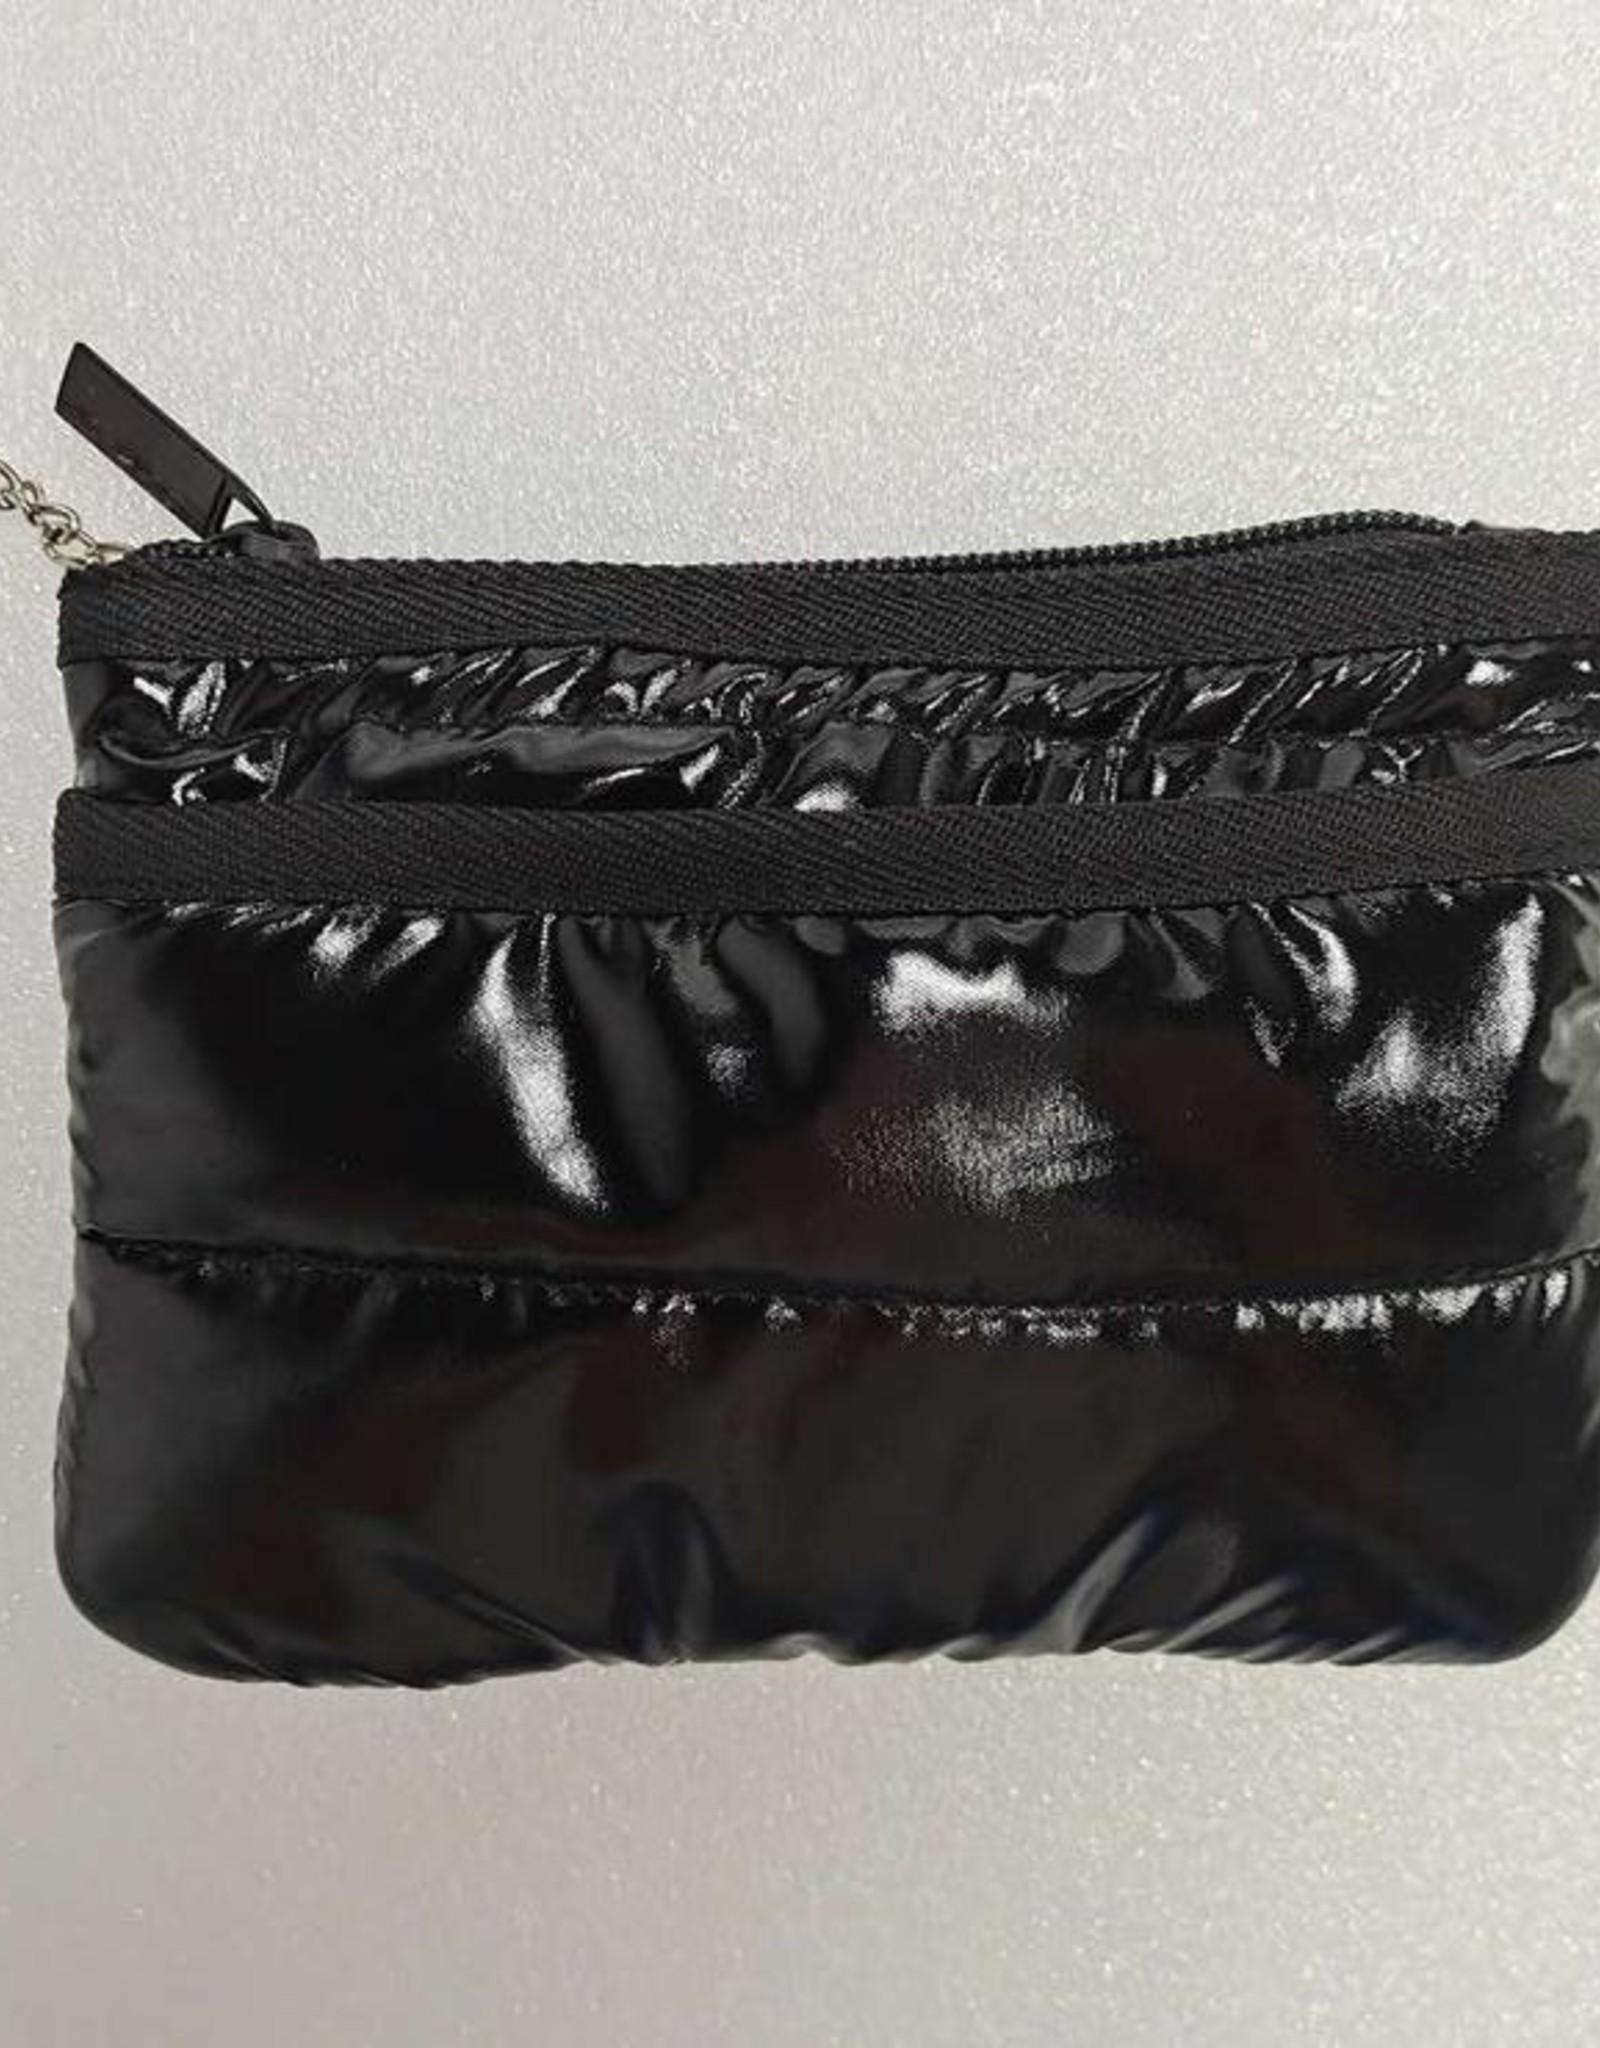 Max noir card/key case black